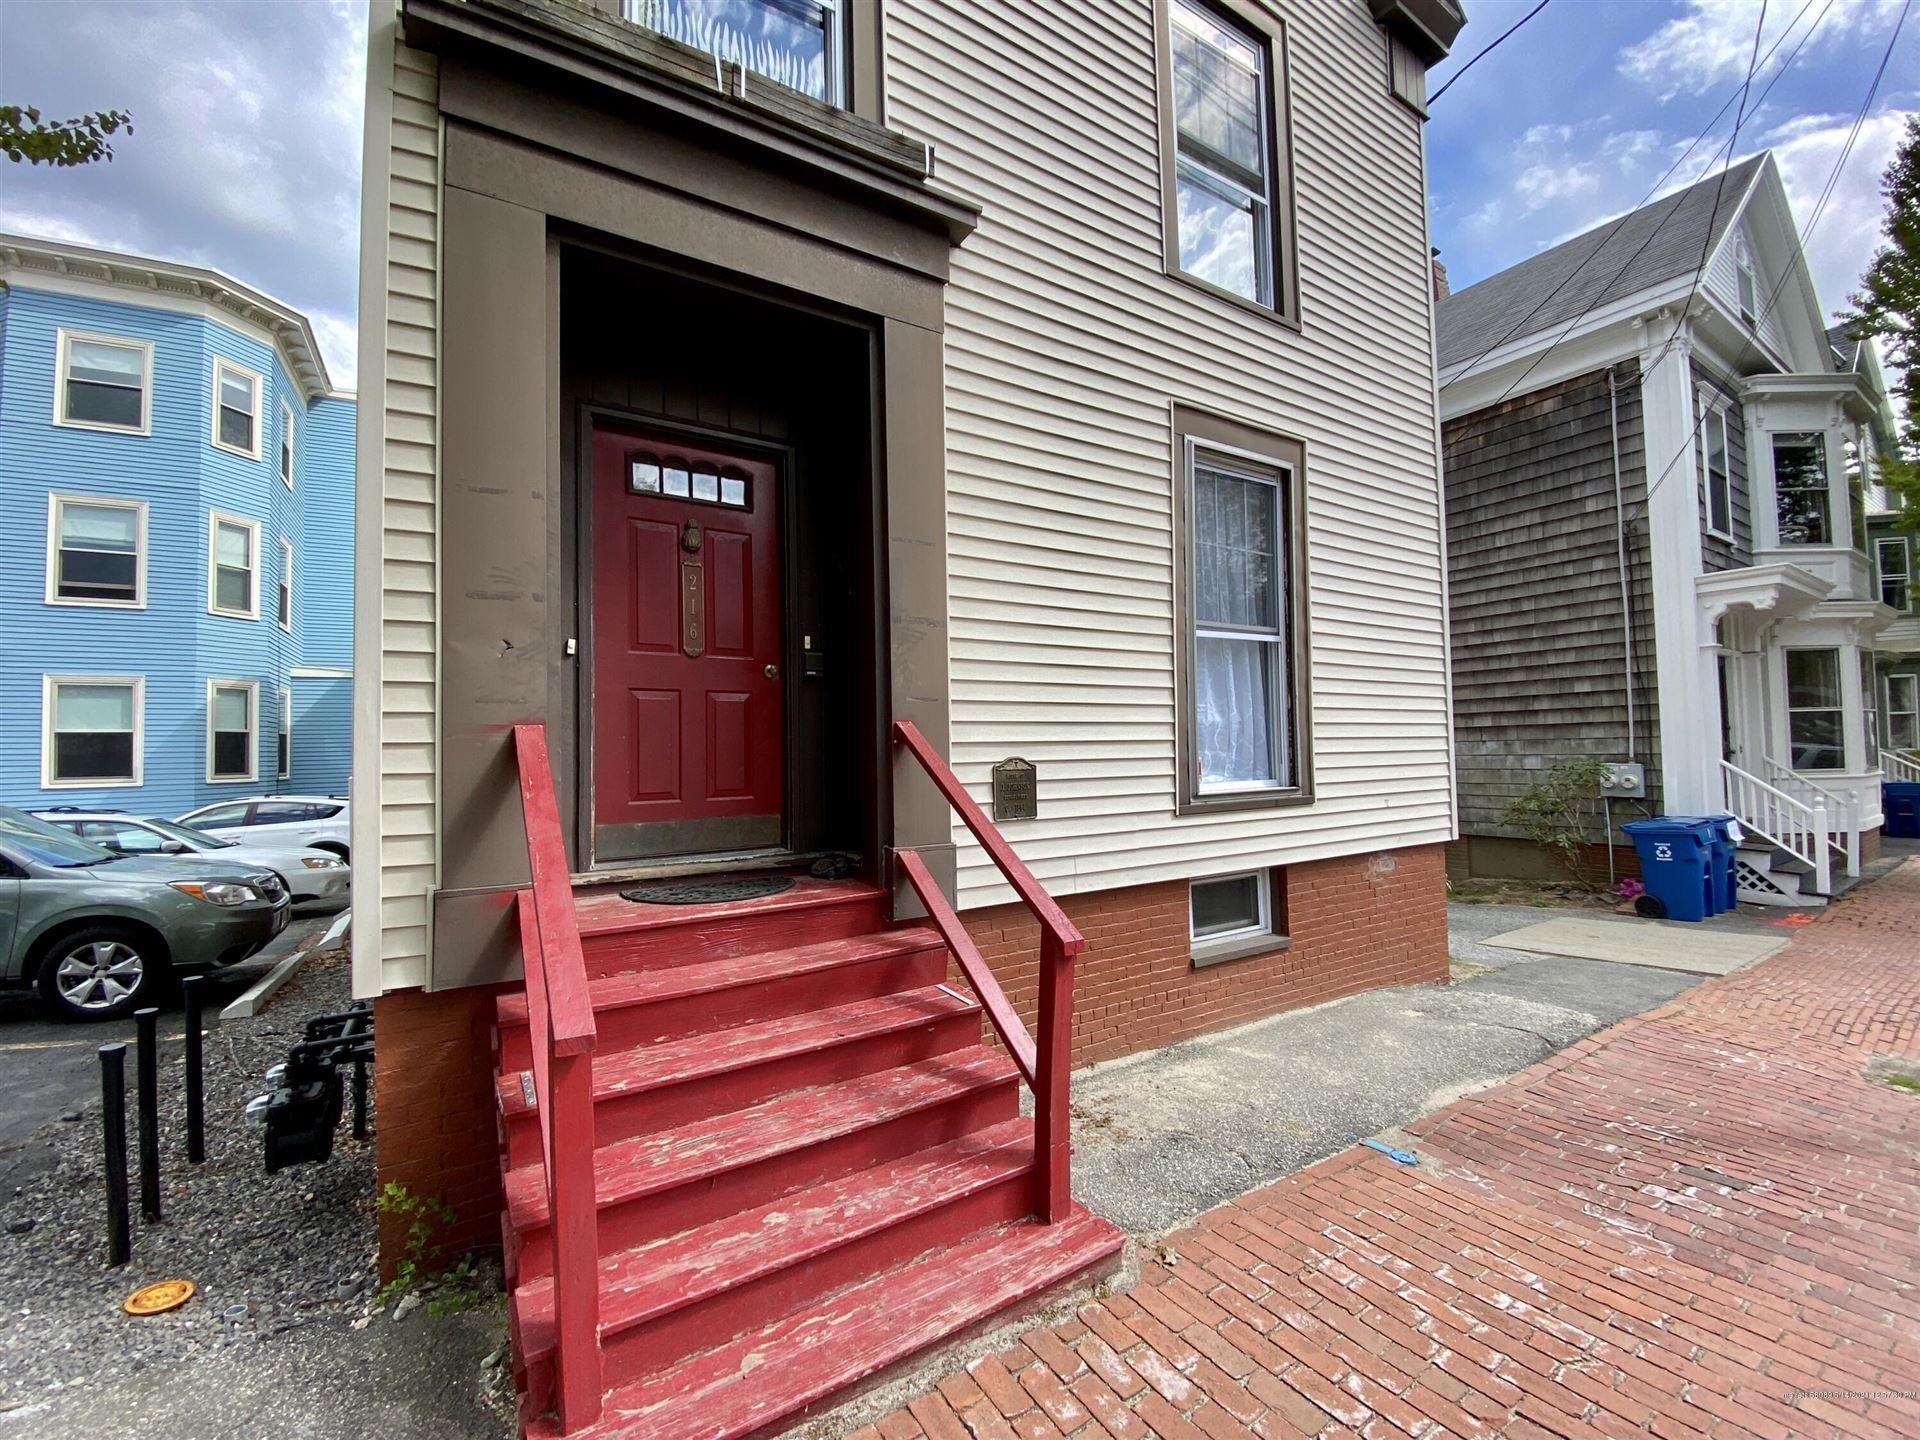 Photo of 216 Spring Street, Portland, ME 04102 (MLS # 1491518)